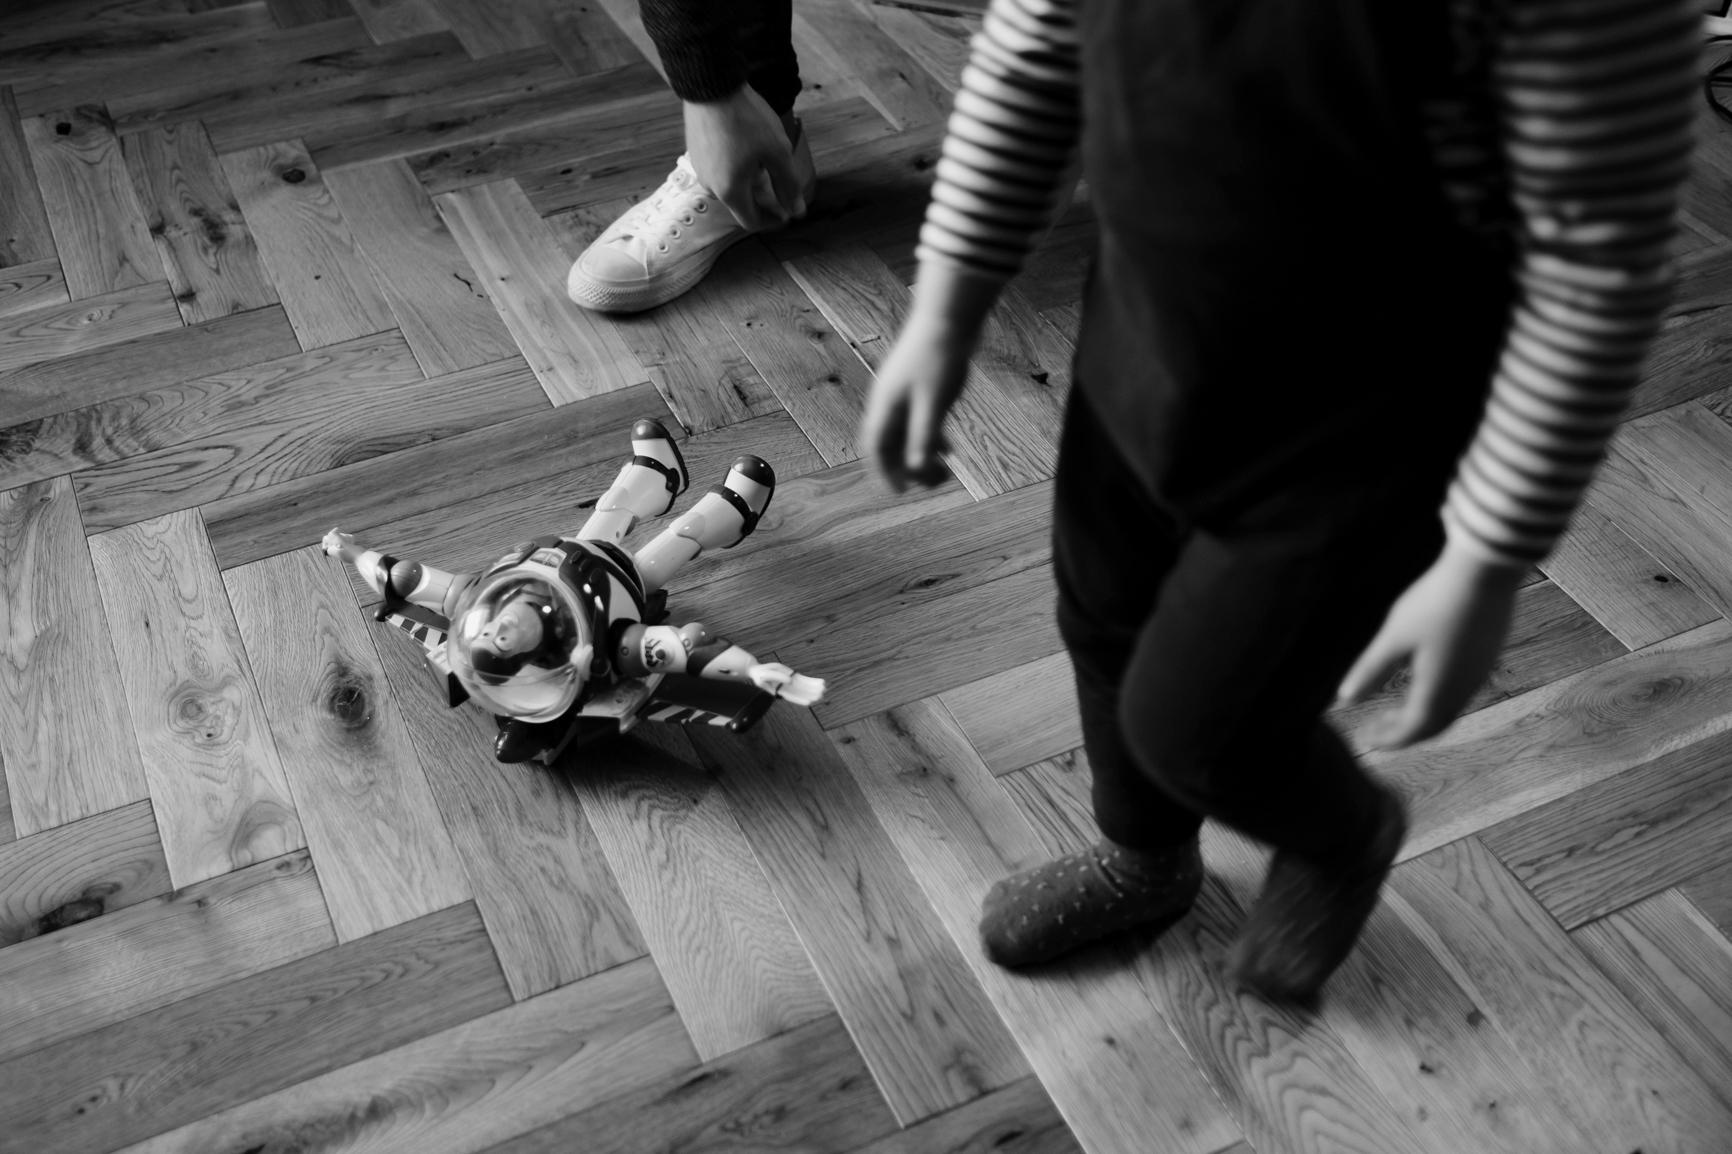 Child walks past toy on the floor.